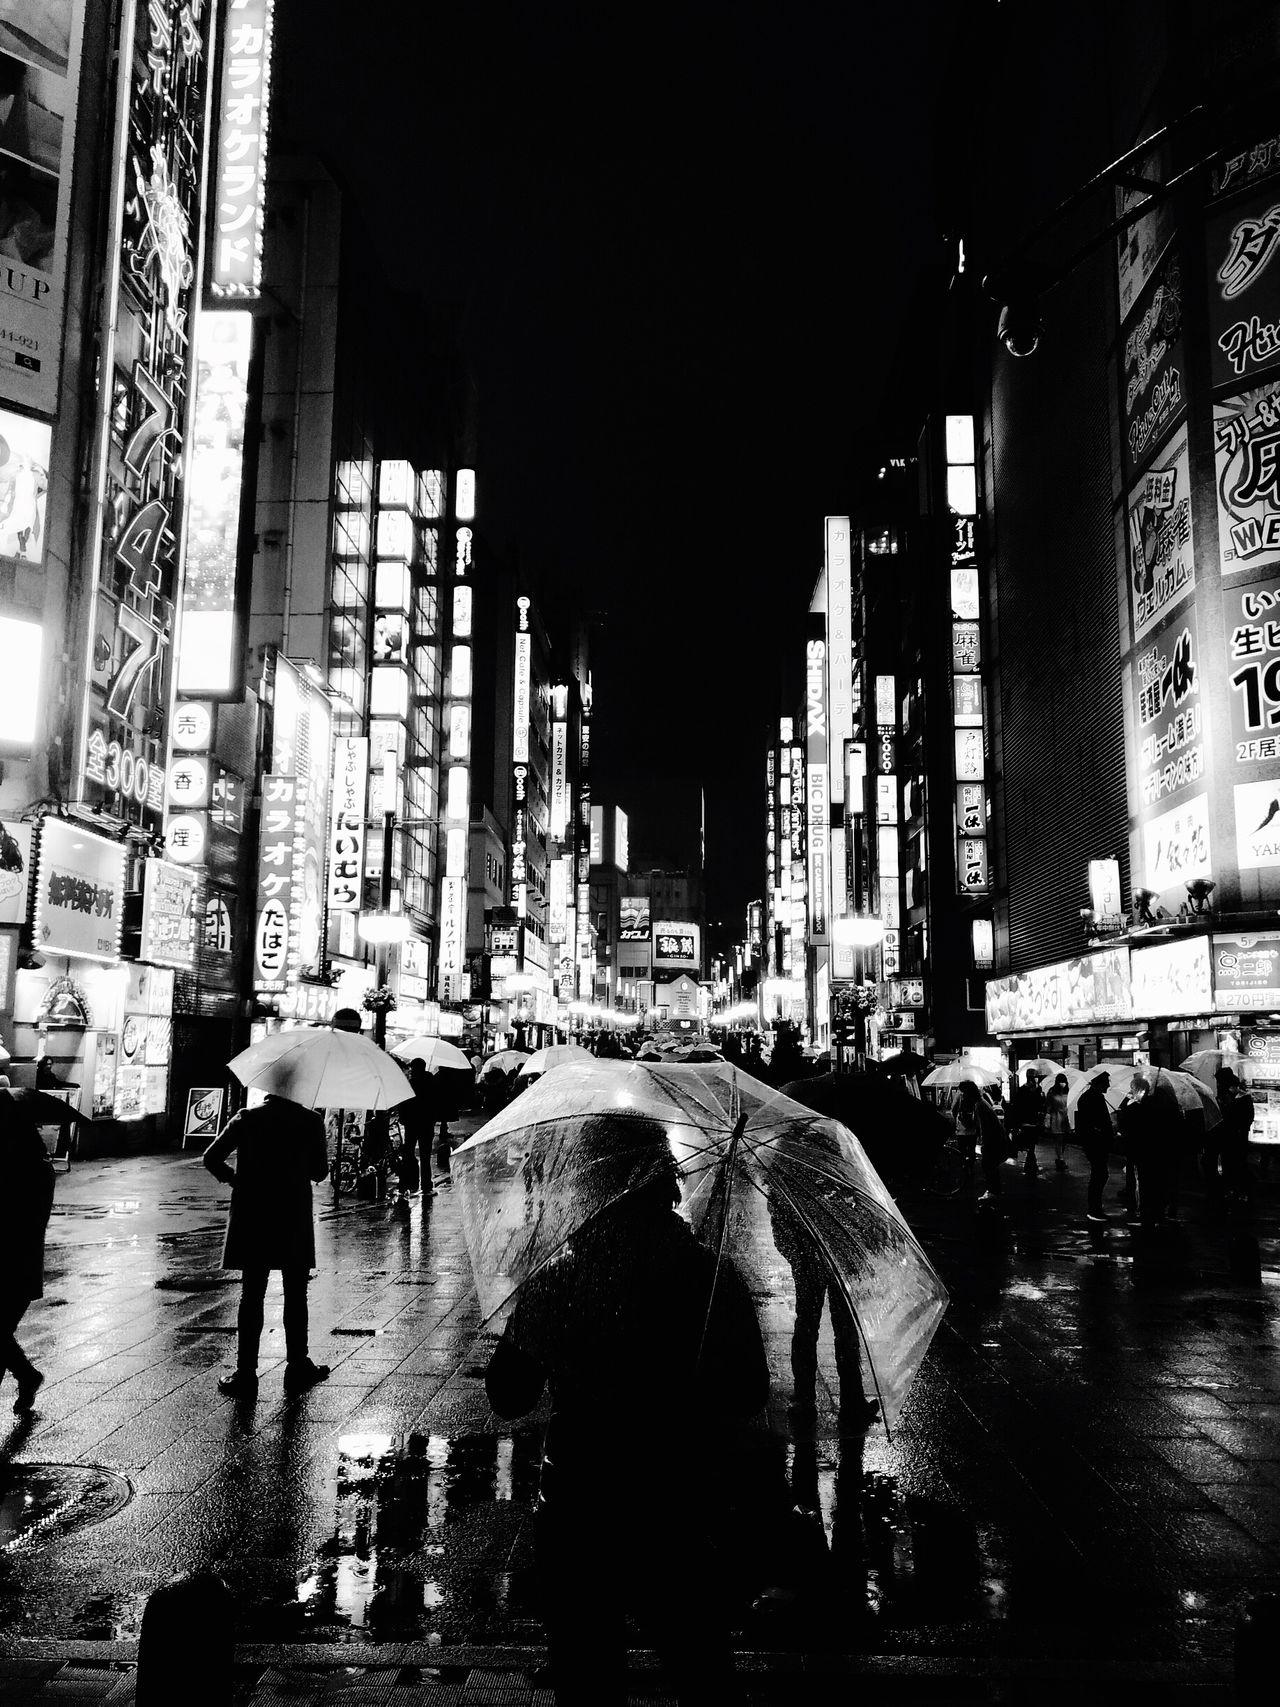 Japan Backgrounds Architecture Men People City Life Night Walking City Outdoors Umbrella Rainy Days